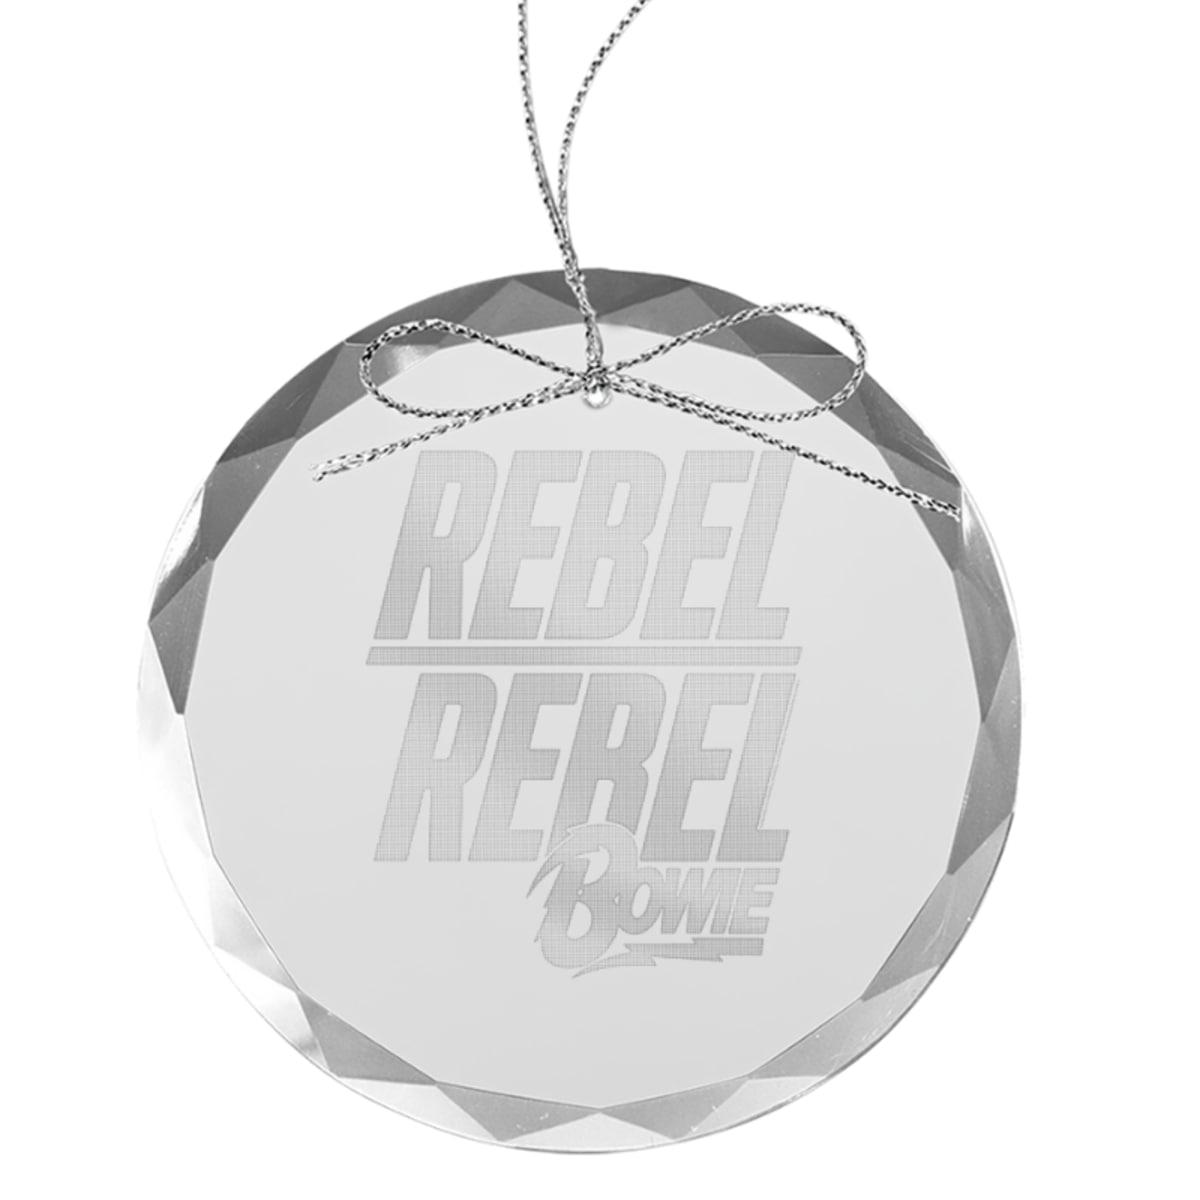 Rebel Rebel Round Laser-Etched Glass Ornament